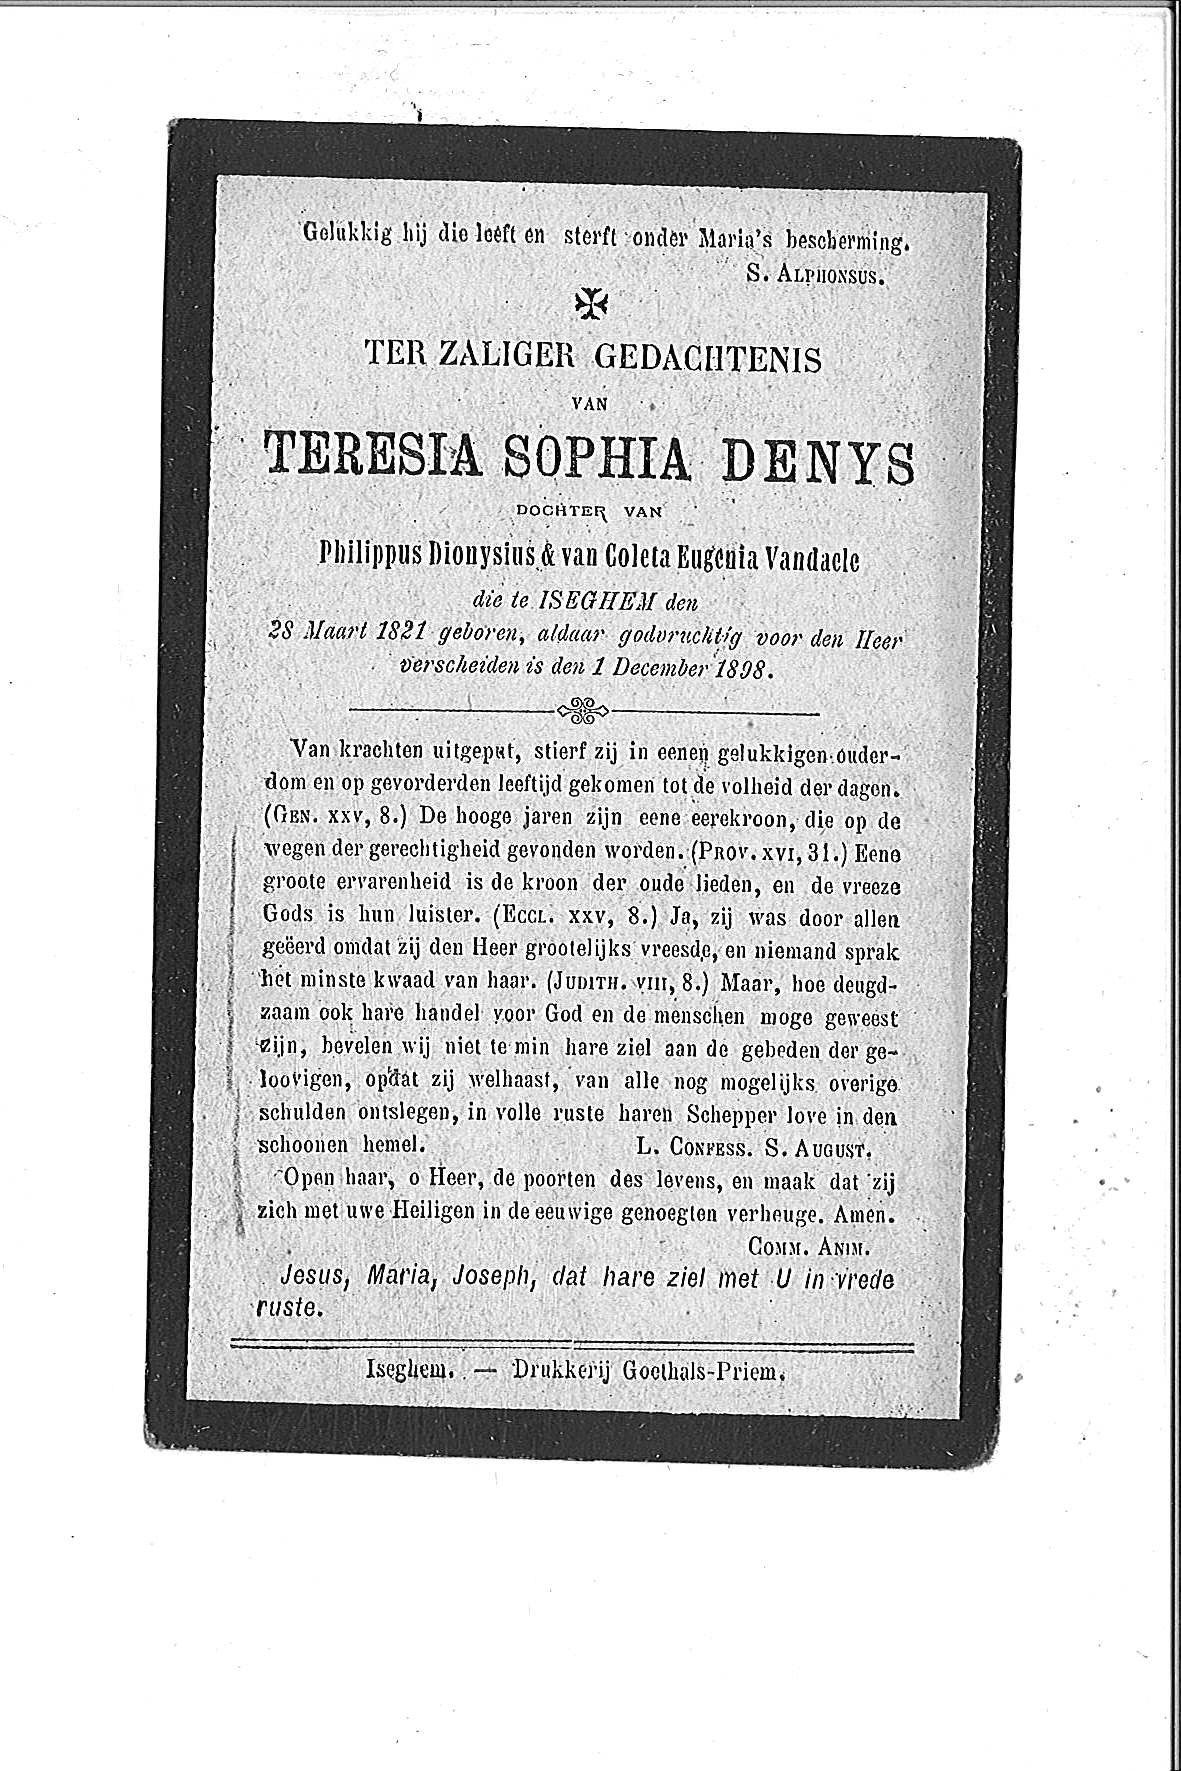 Teresia-Sophia(1898)20150415130638_00054.jpg